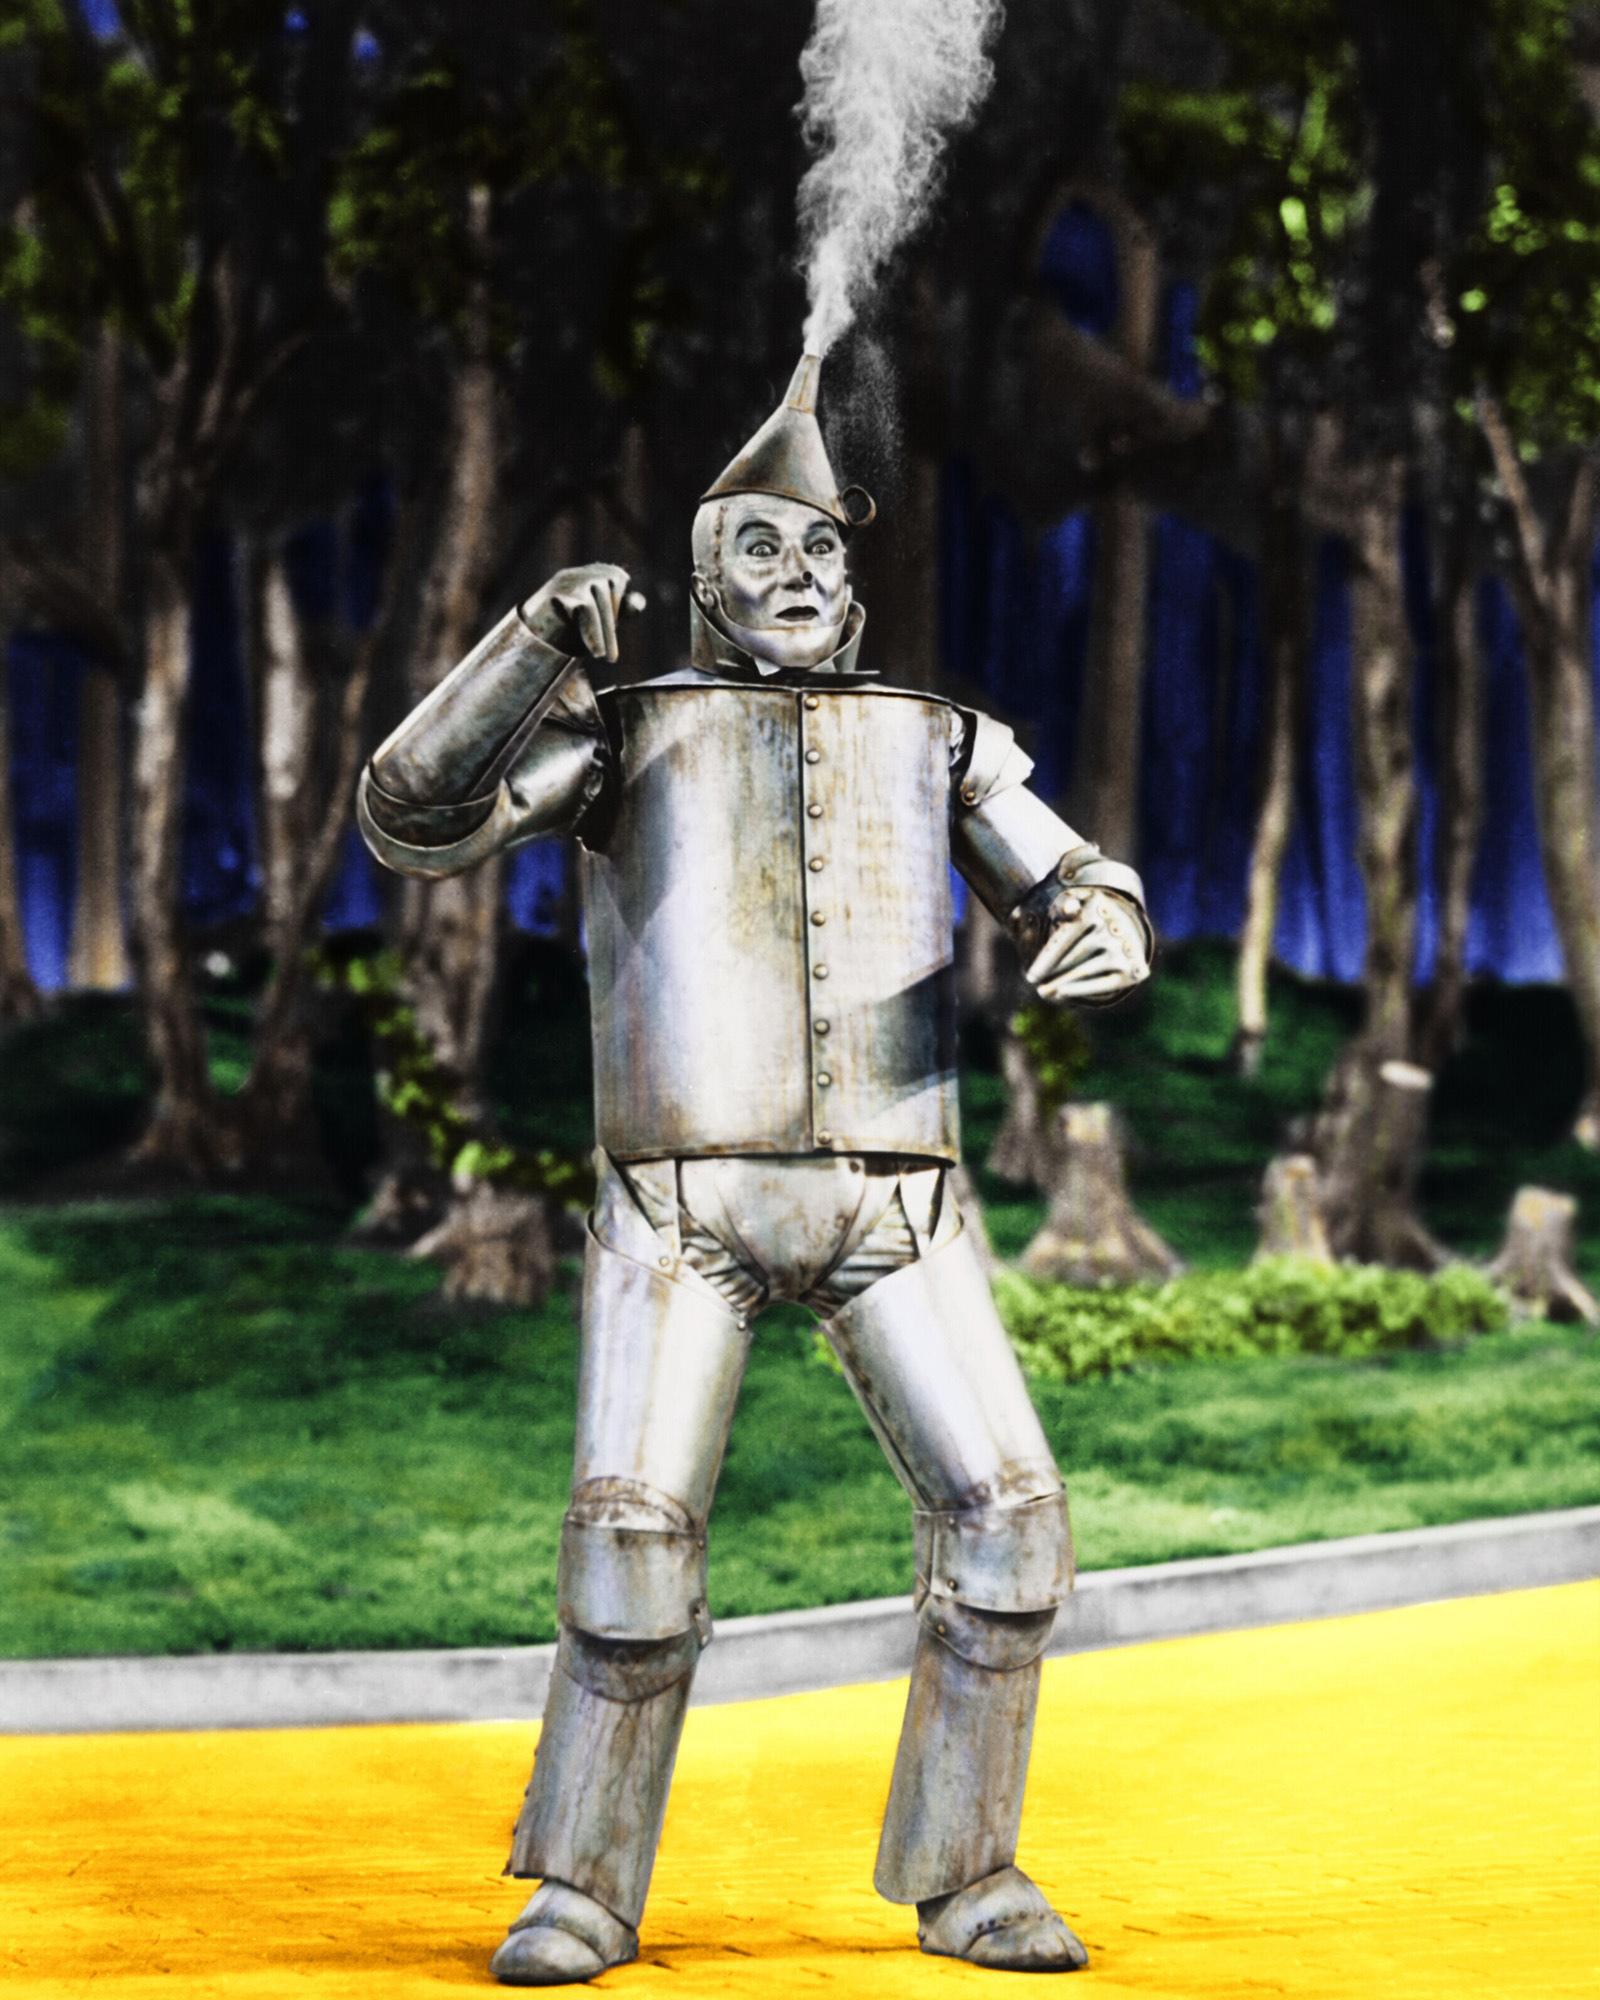 Stills The Wizard Of Oz Photo 19566570 Fanpop